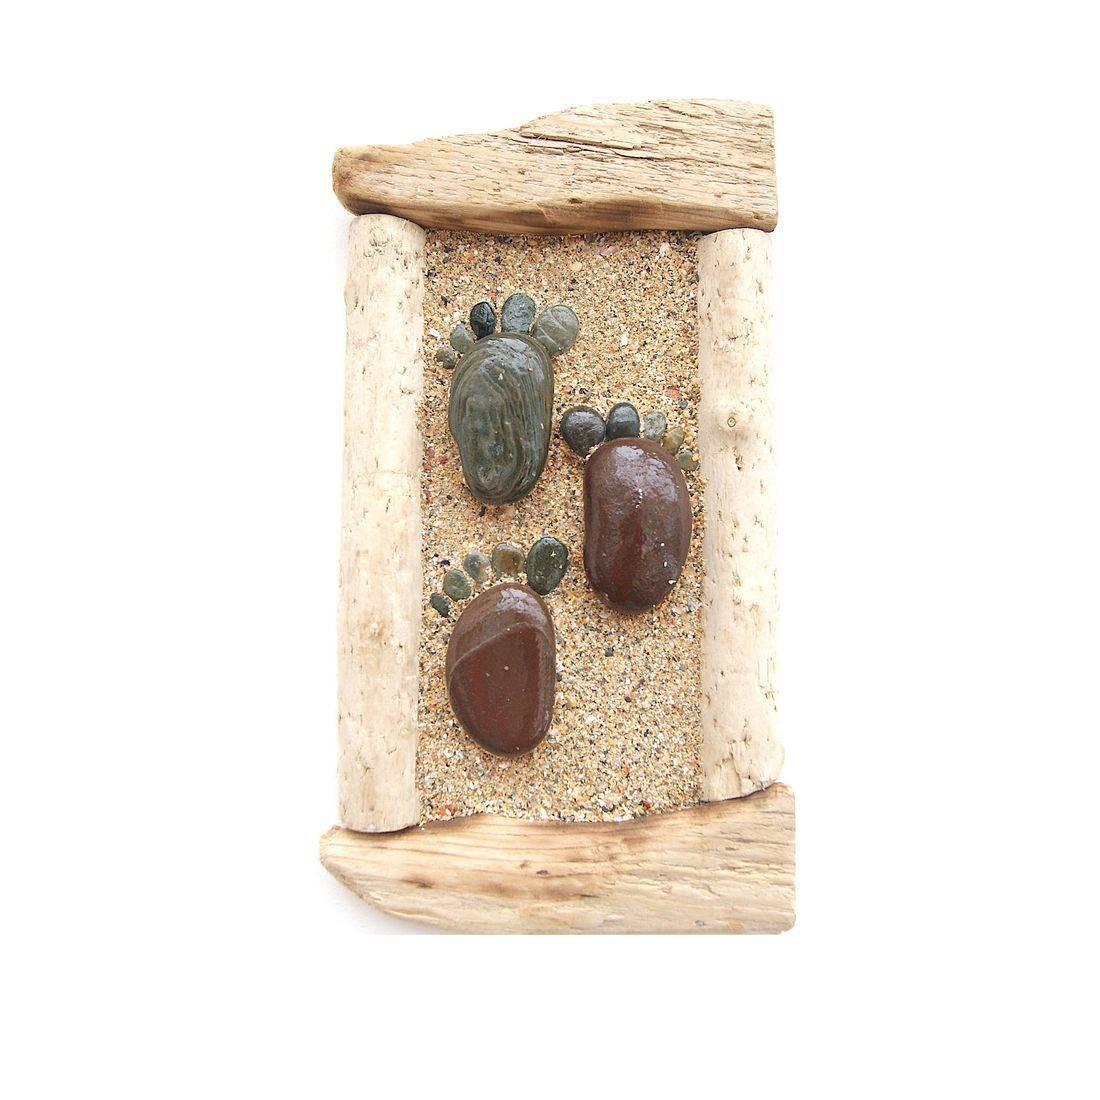 Driftwood stone art 16